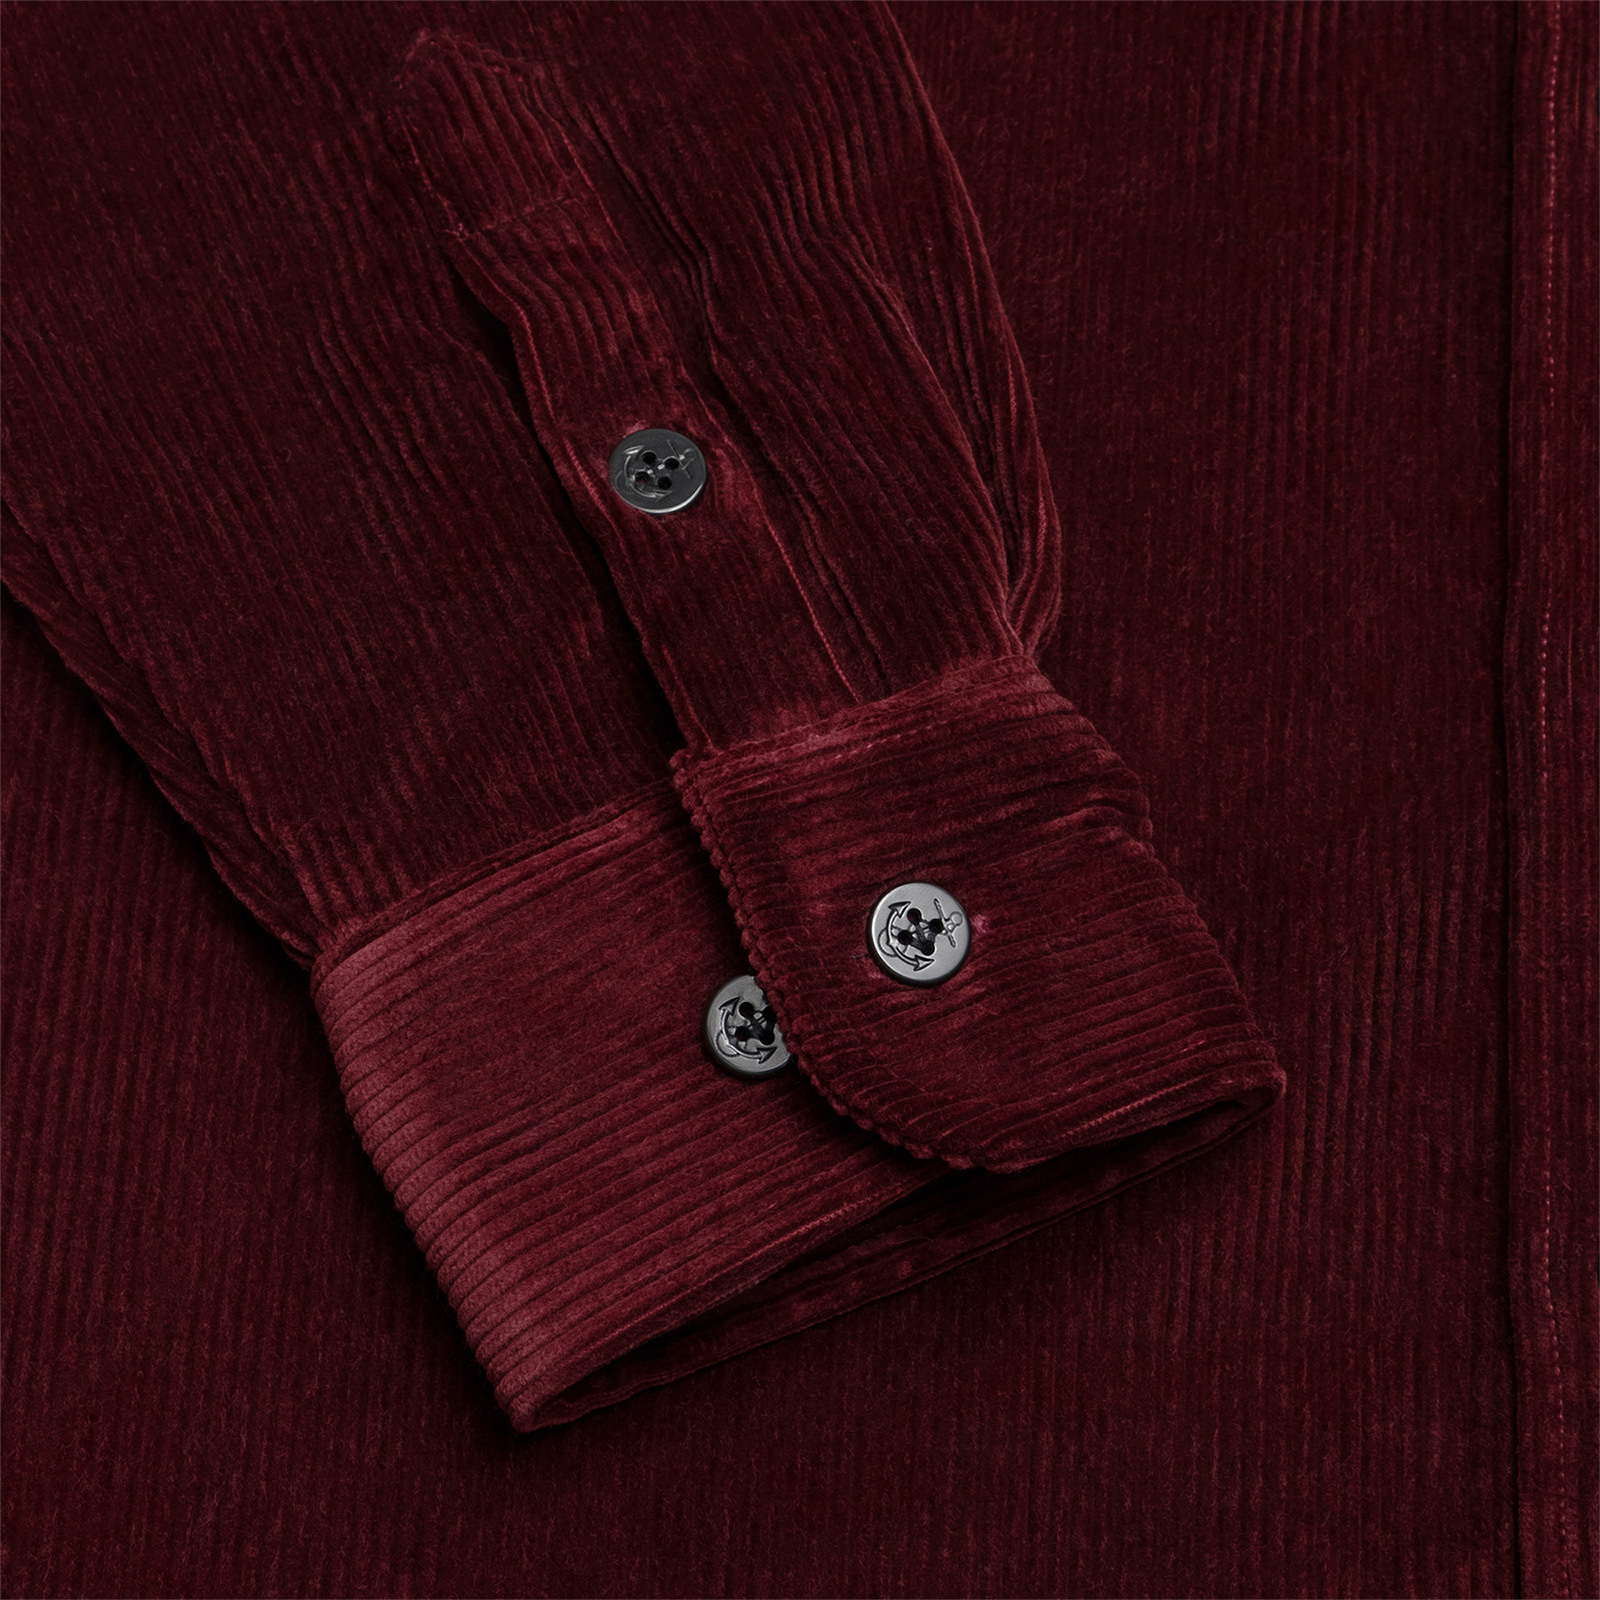 Sleeve close up product image